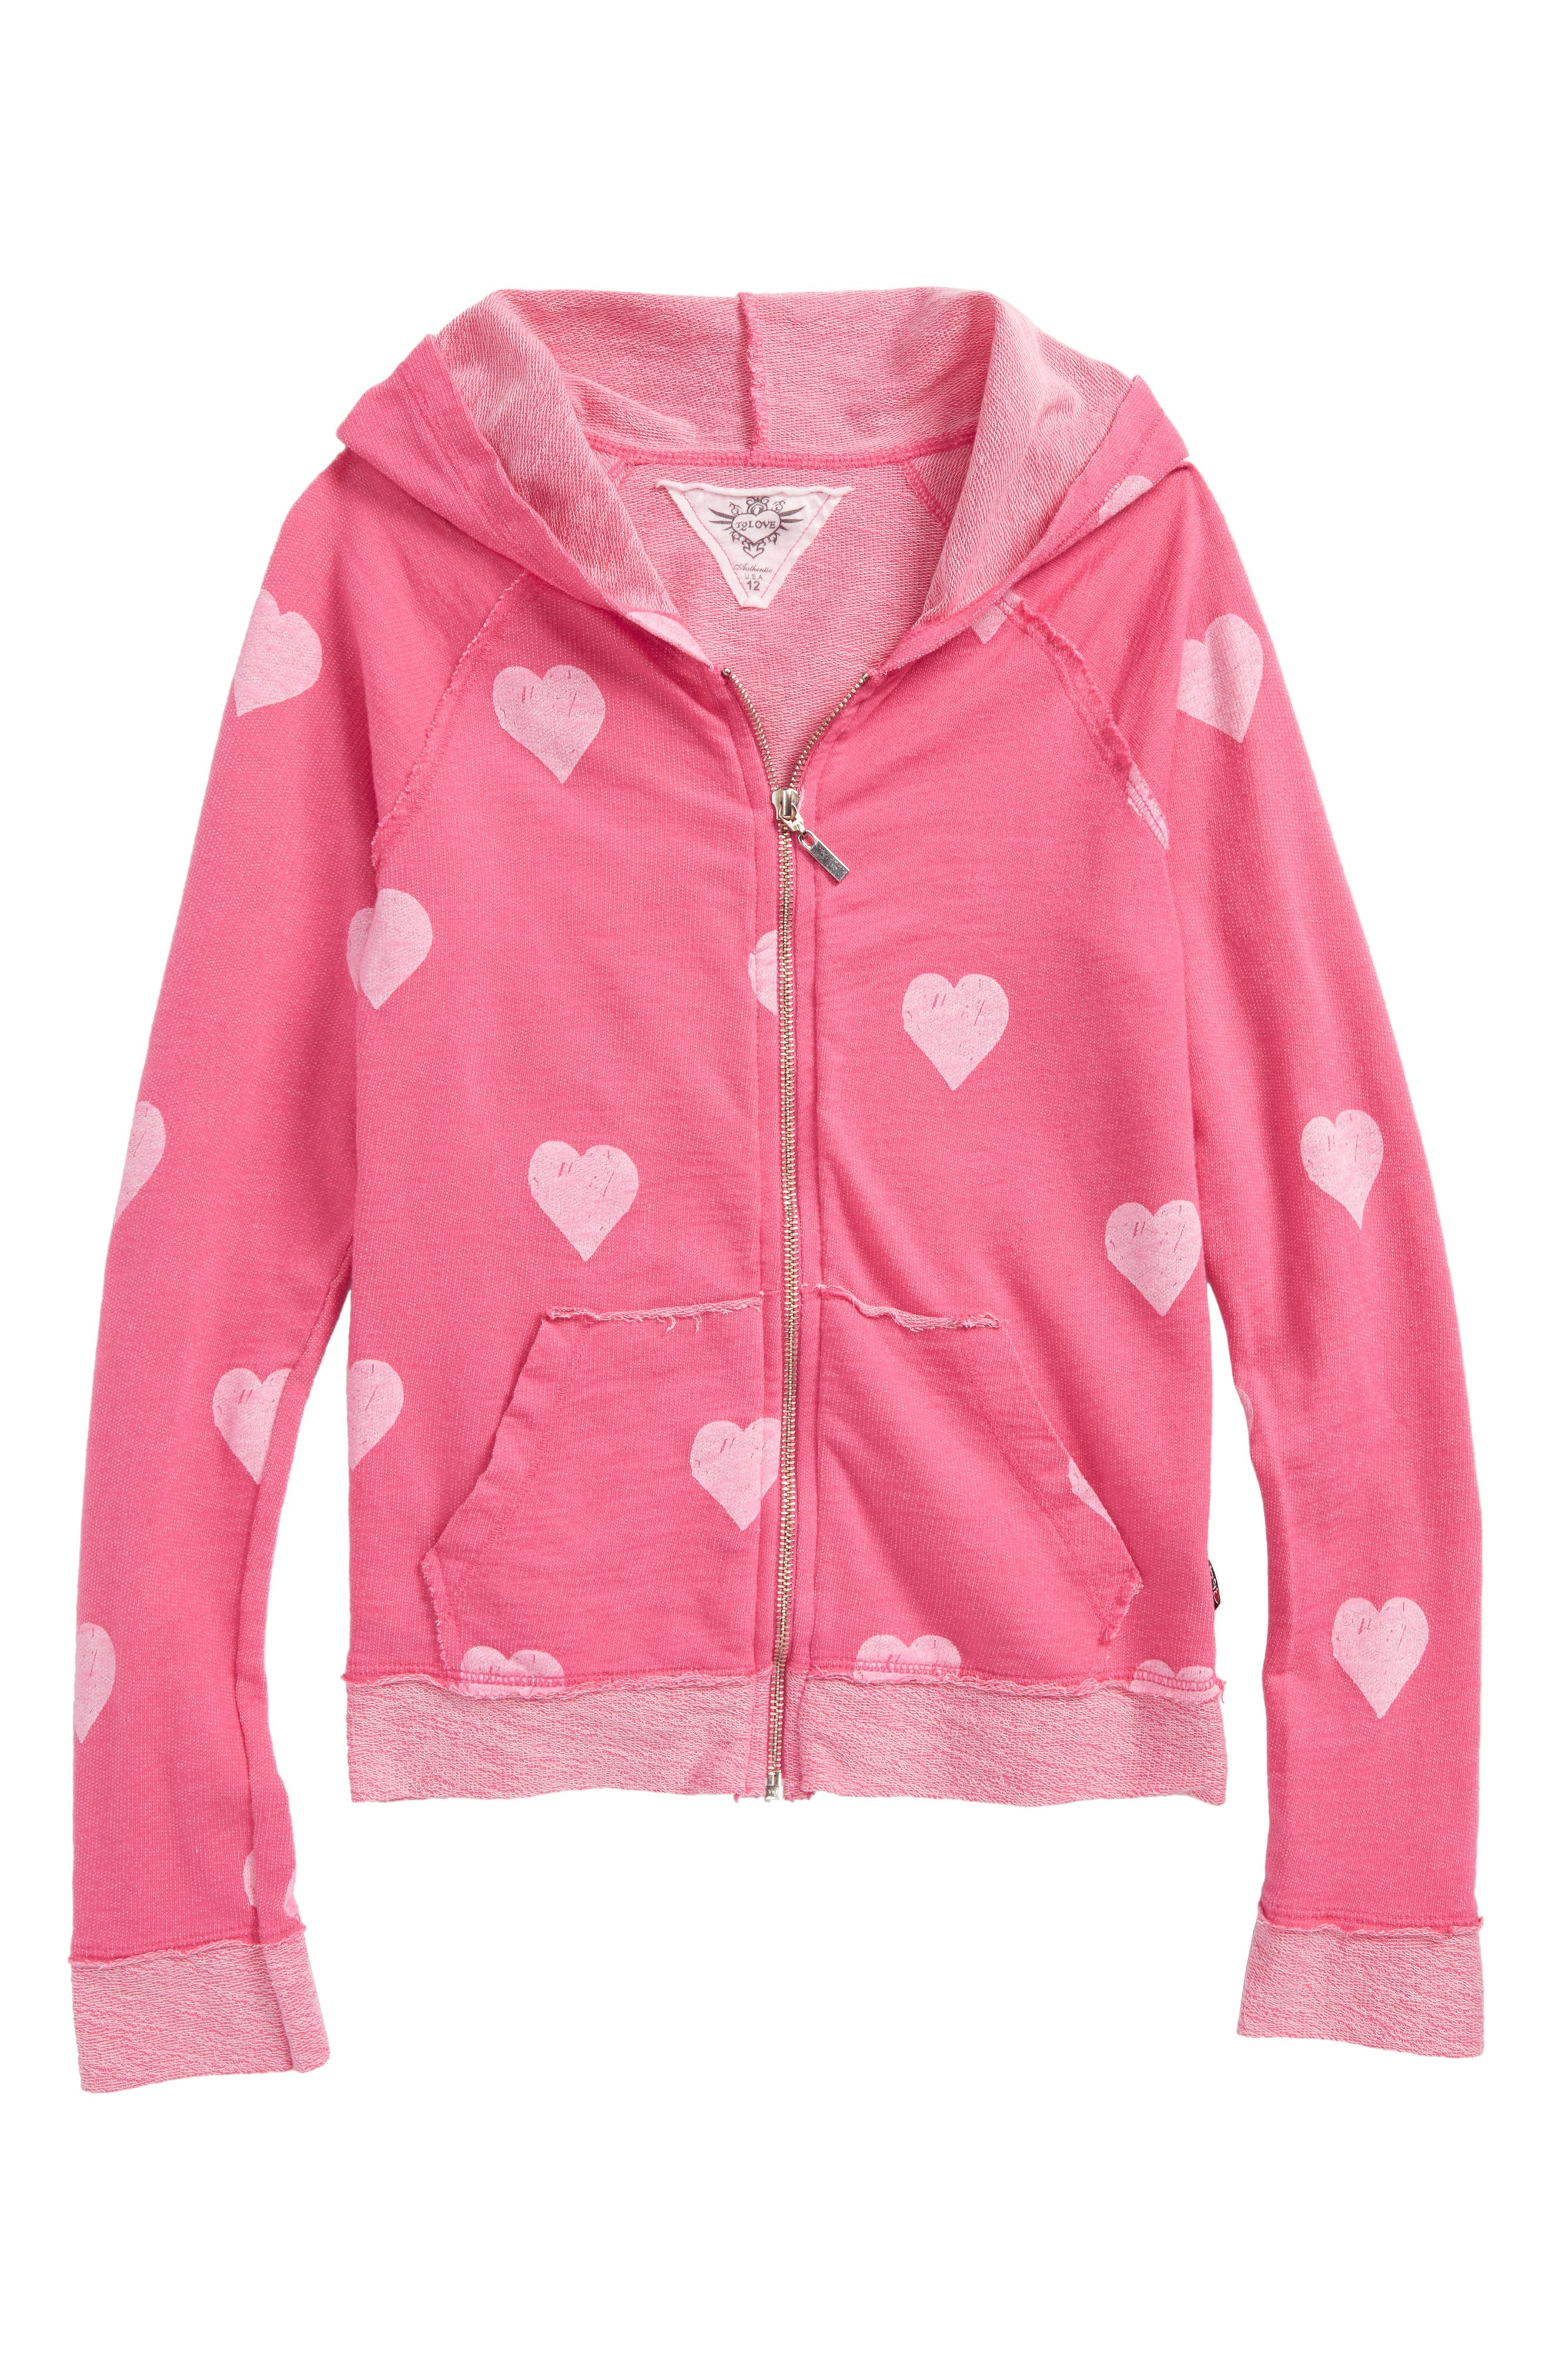 Main Image - T2 Love Allover Heart Zip Hoodie (Big Girls)